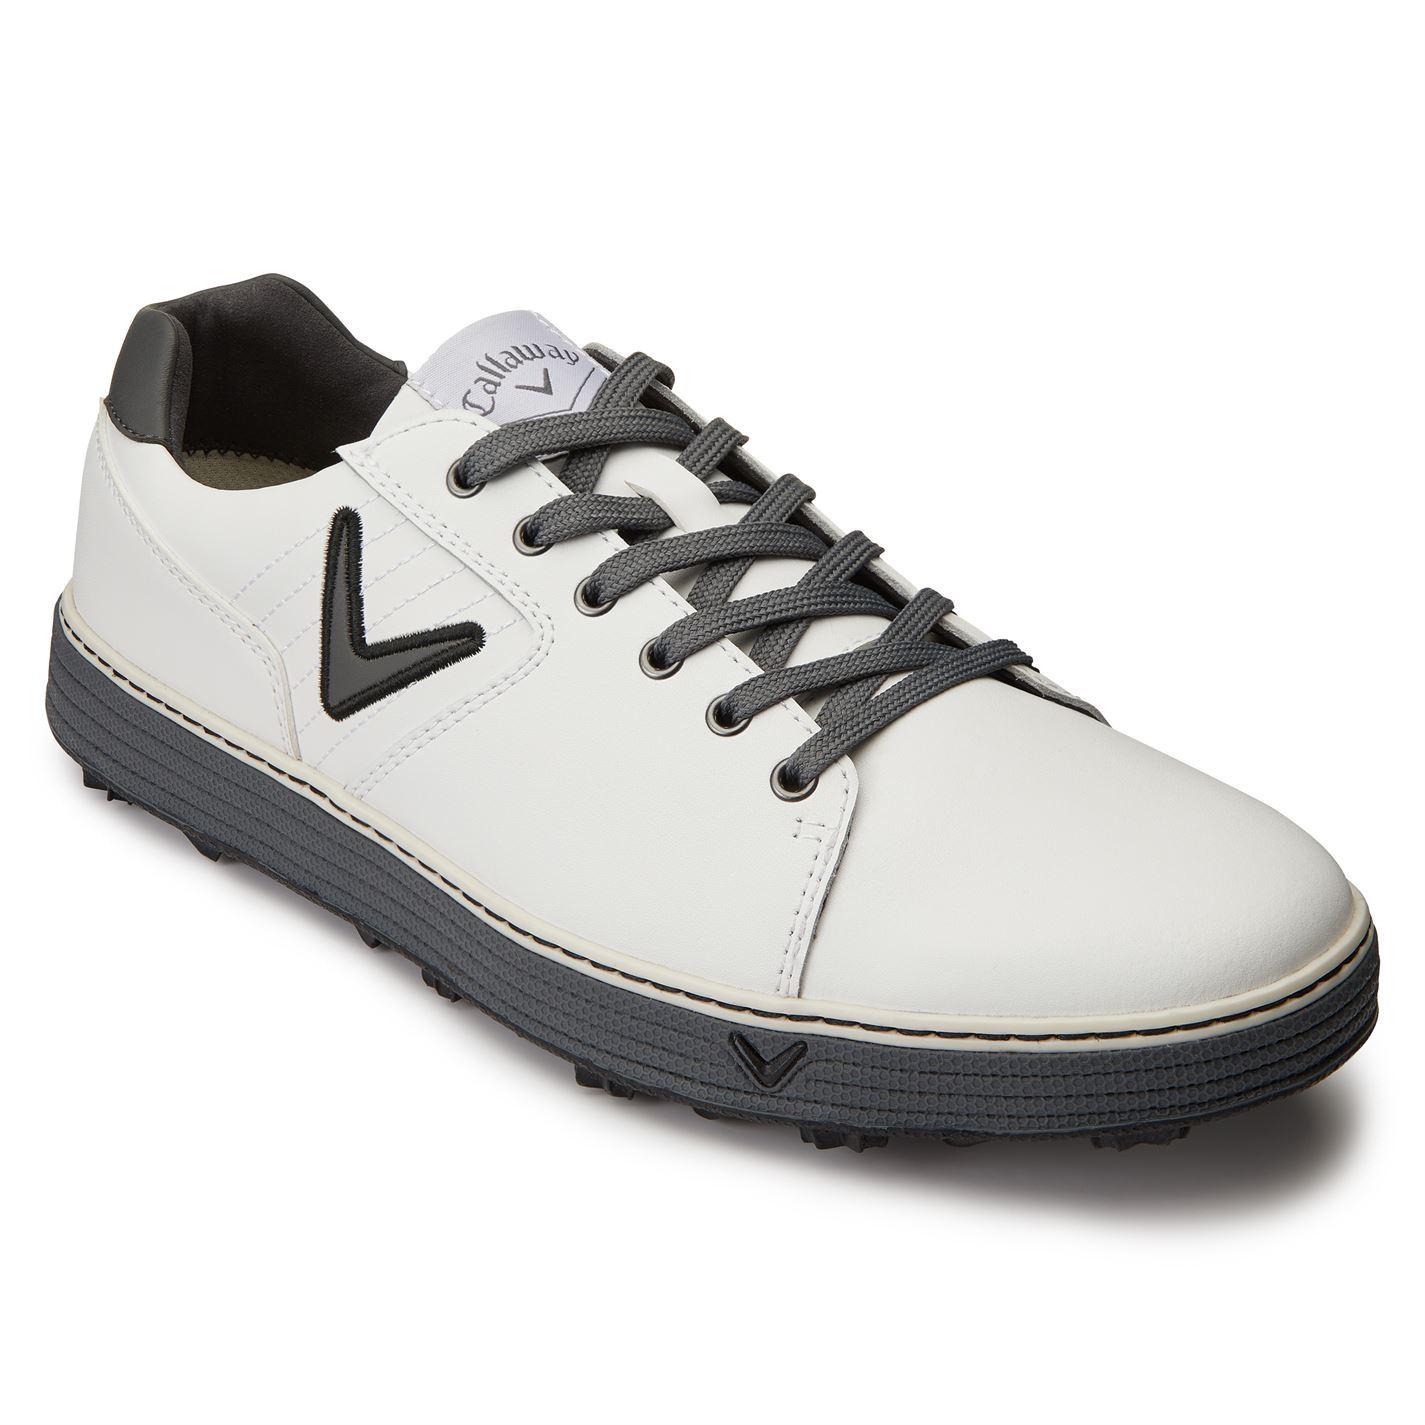 Callaway-Delmar-Urban-Golf-Shoes-Mens-Spikeless-Footwear thumbnail 14